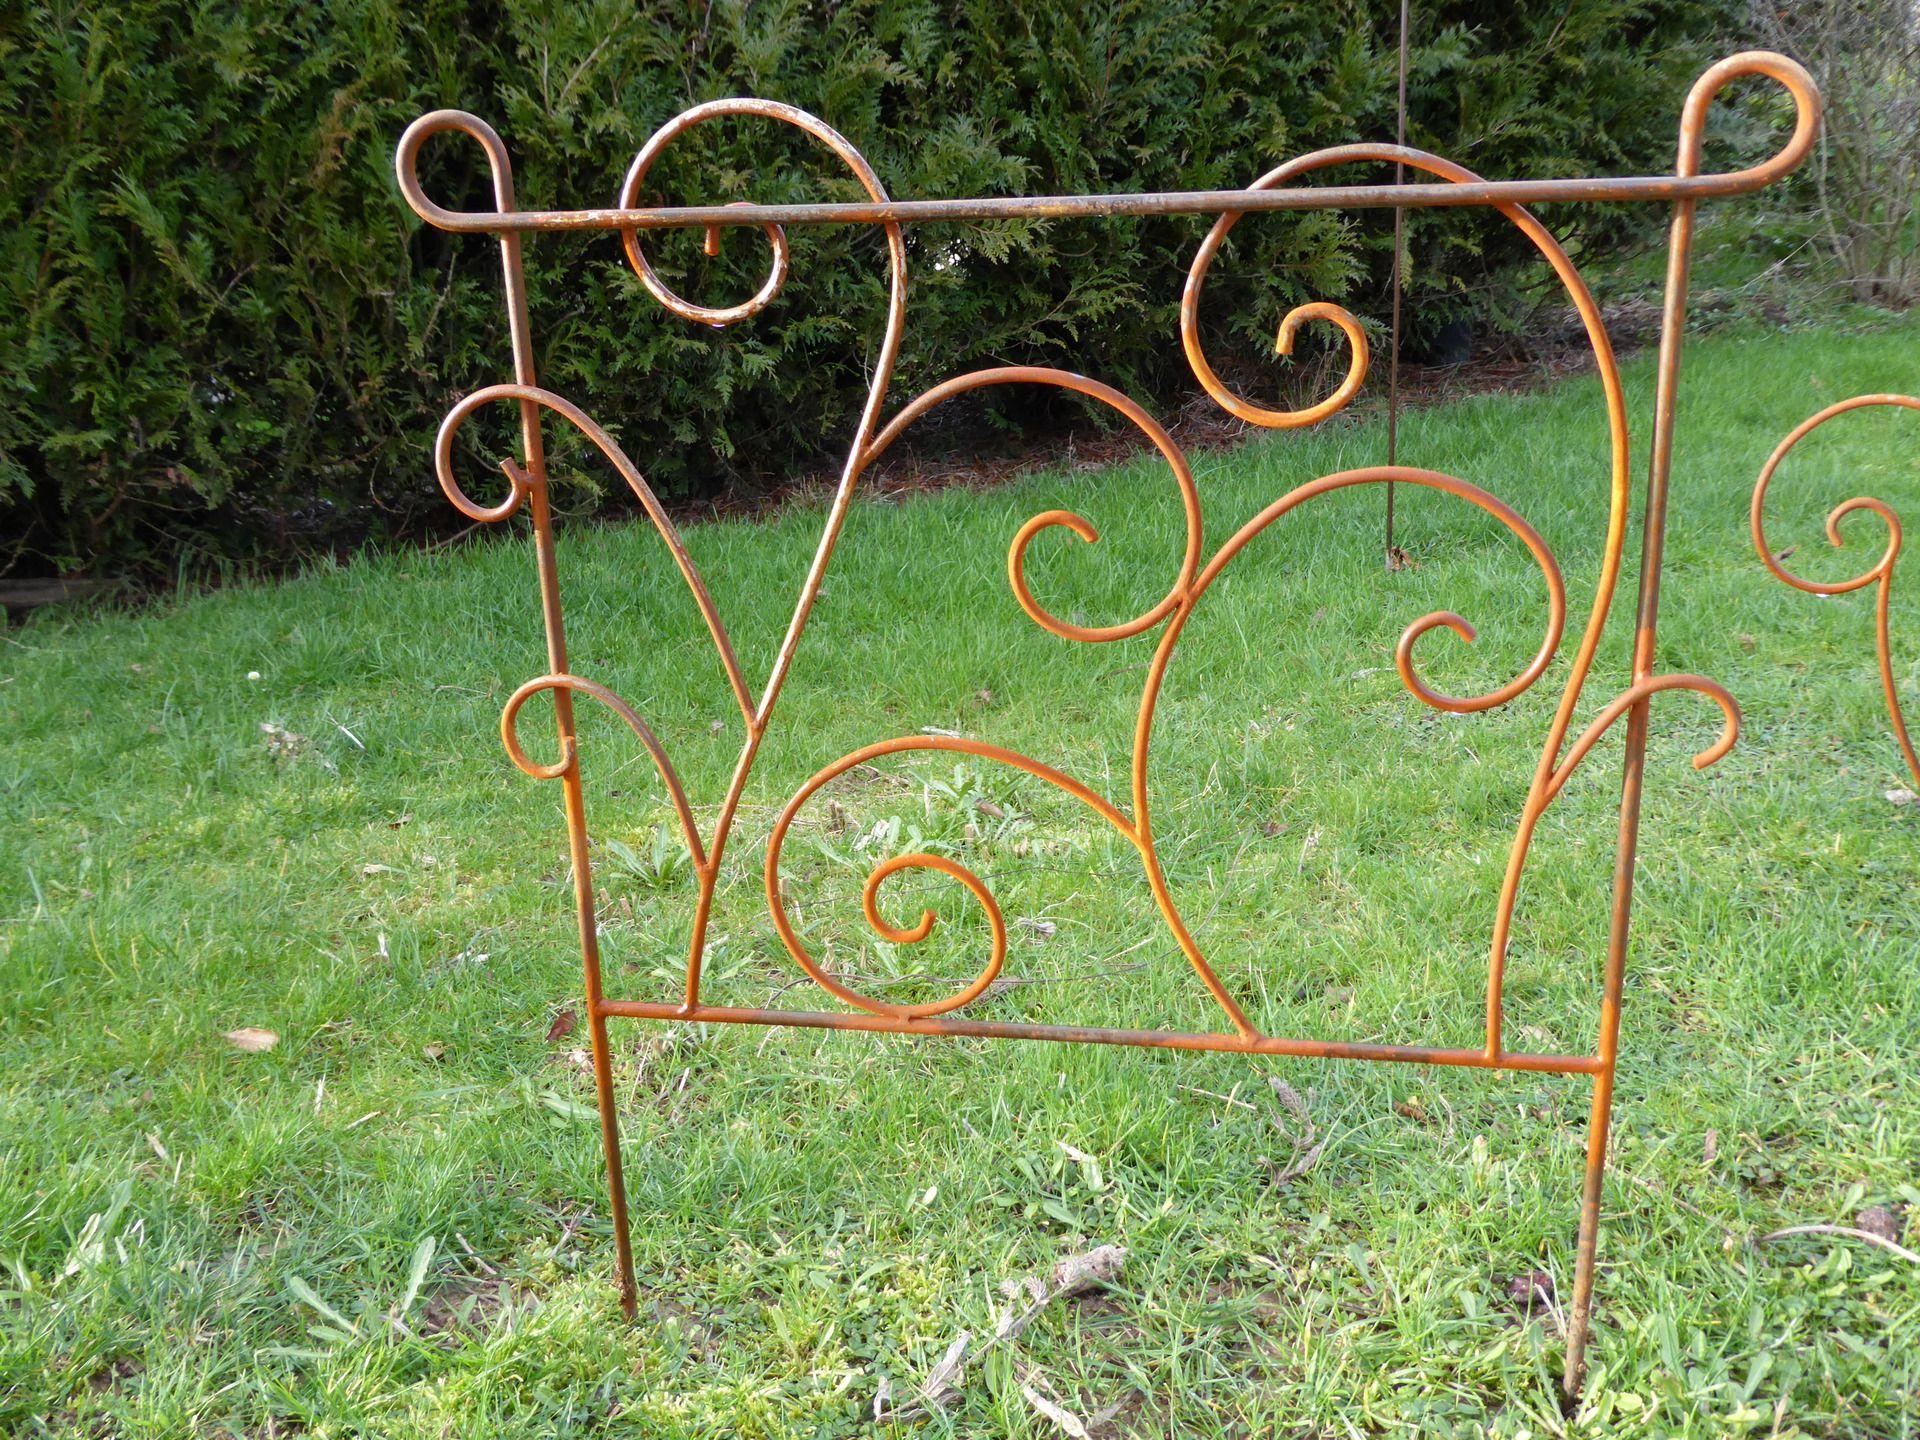 pin by fernande st jean on bricolages m tal pinterest yard art garden art and garden ideas. Black Bedroom Furniture Sets. Home Design Ideas